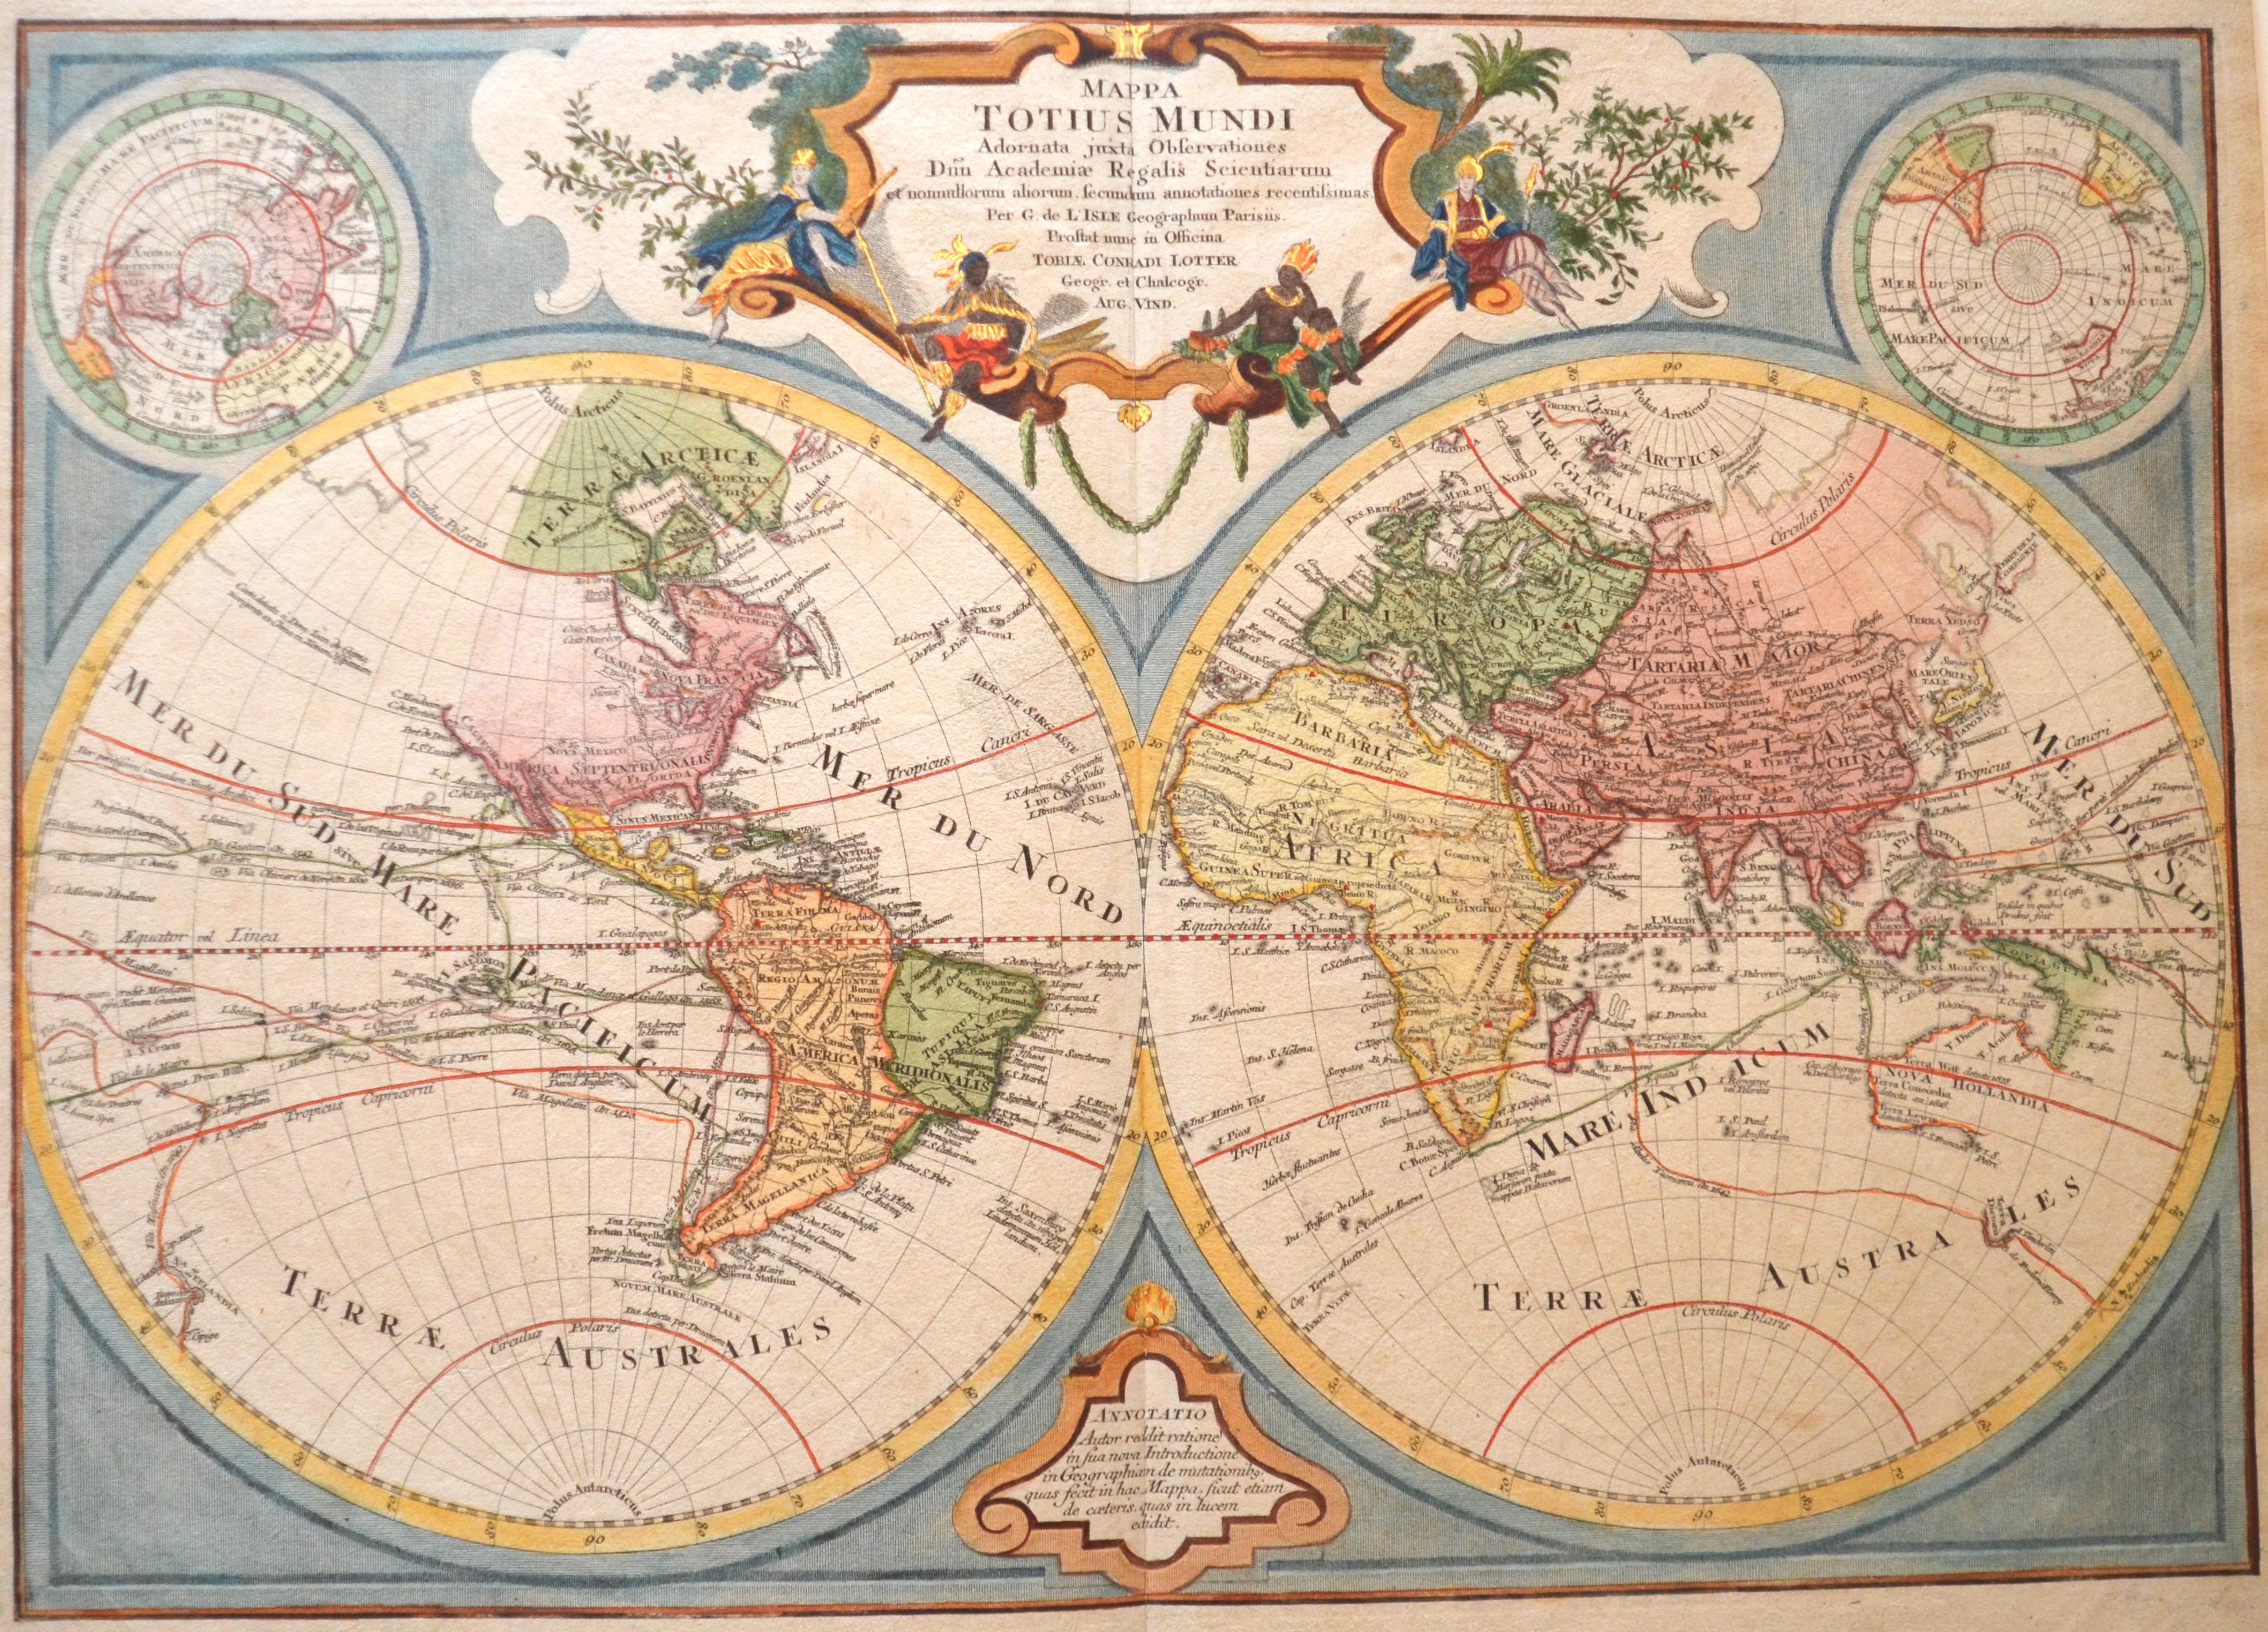 Lotter Tobias Conrad Mappa Totius Mundi Adornata juxta Observationes…